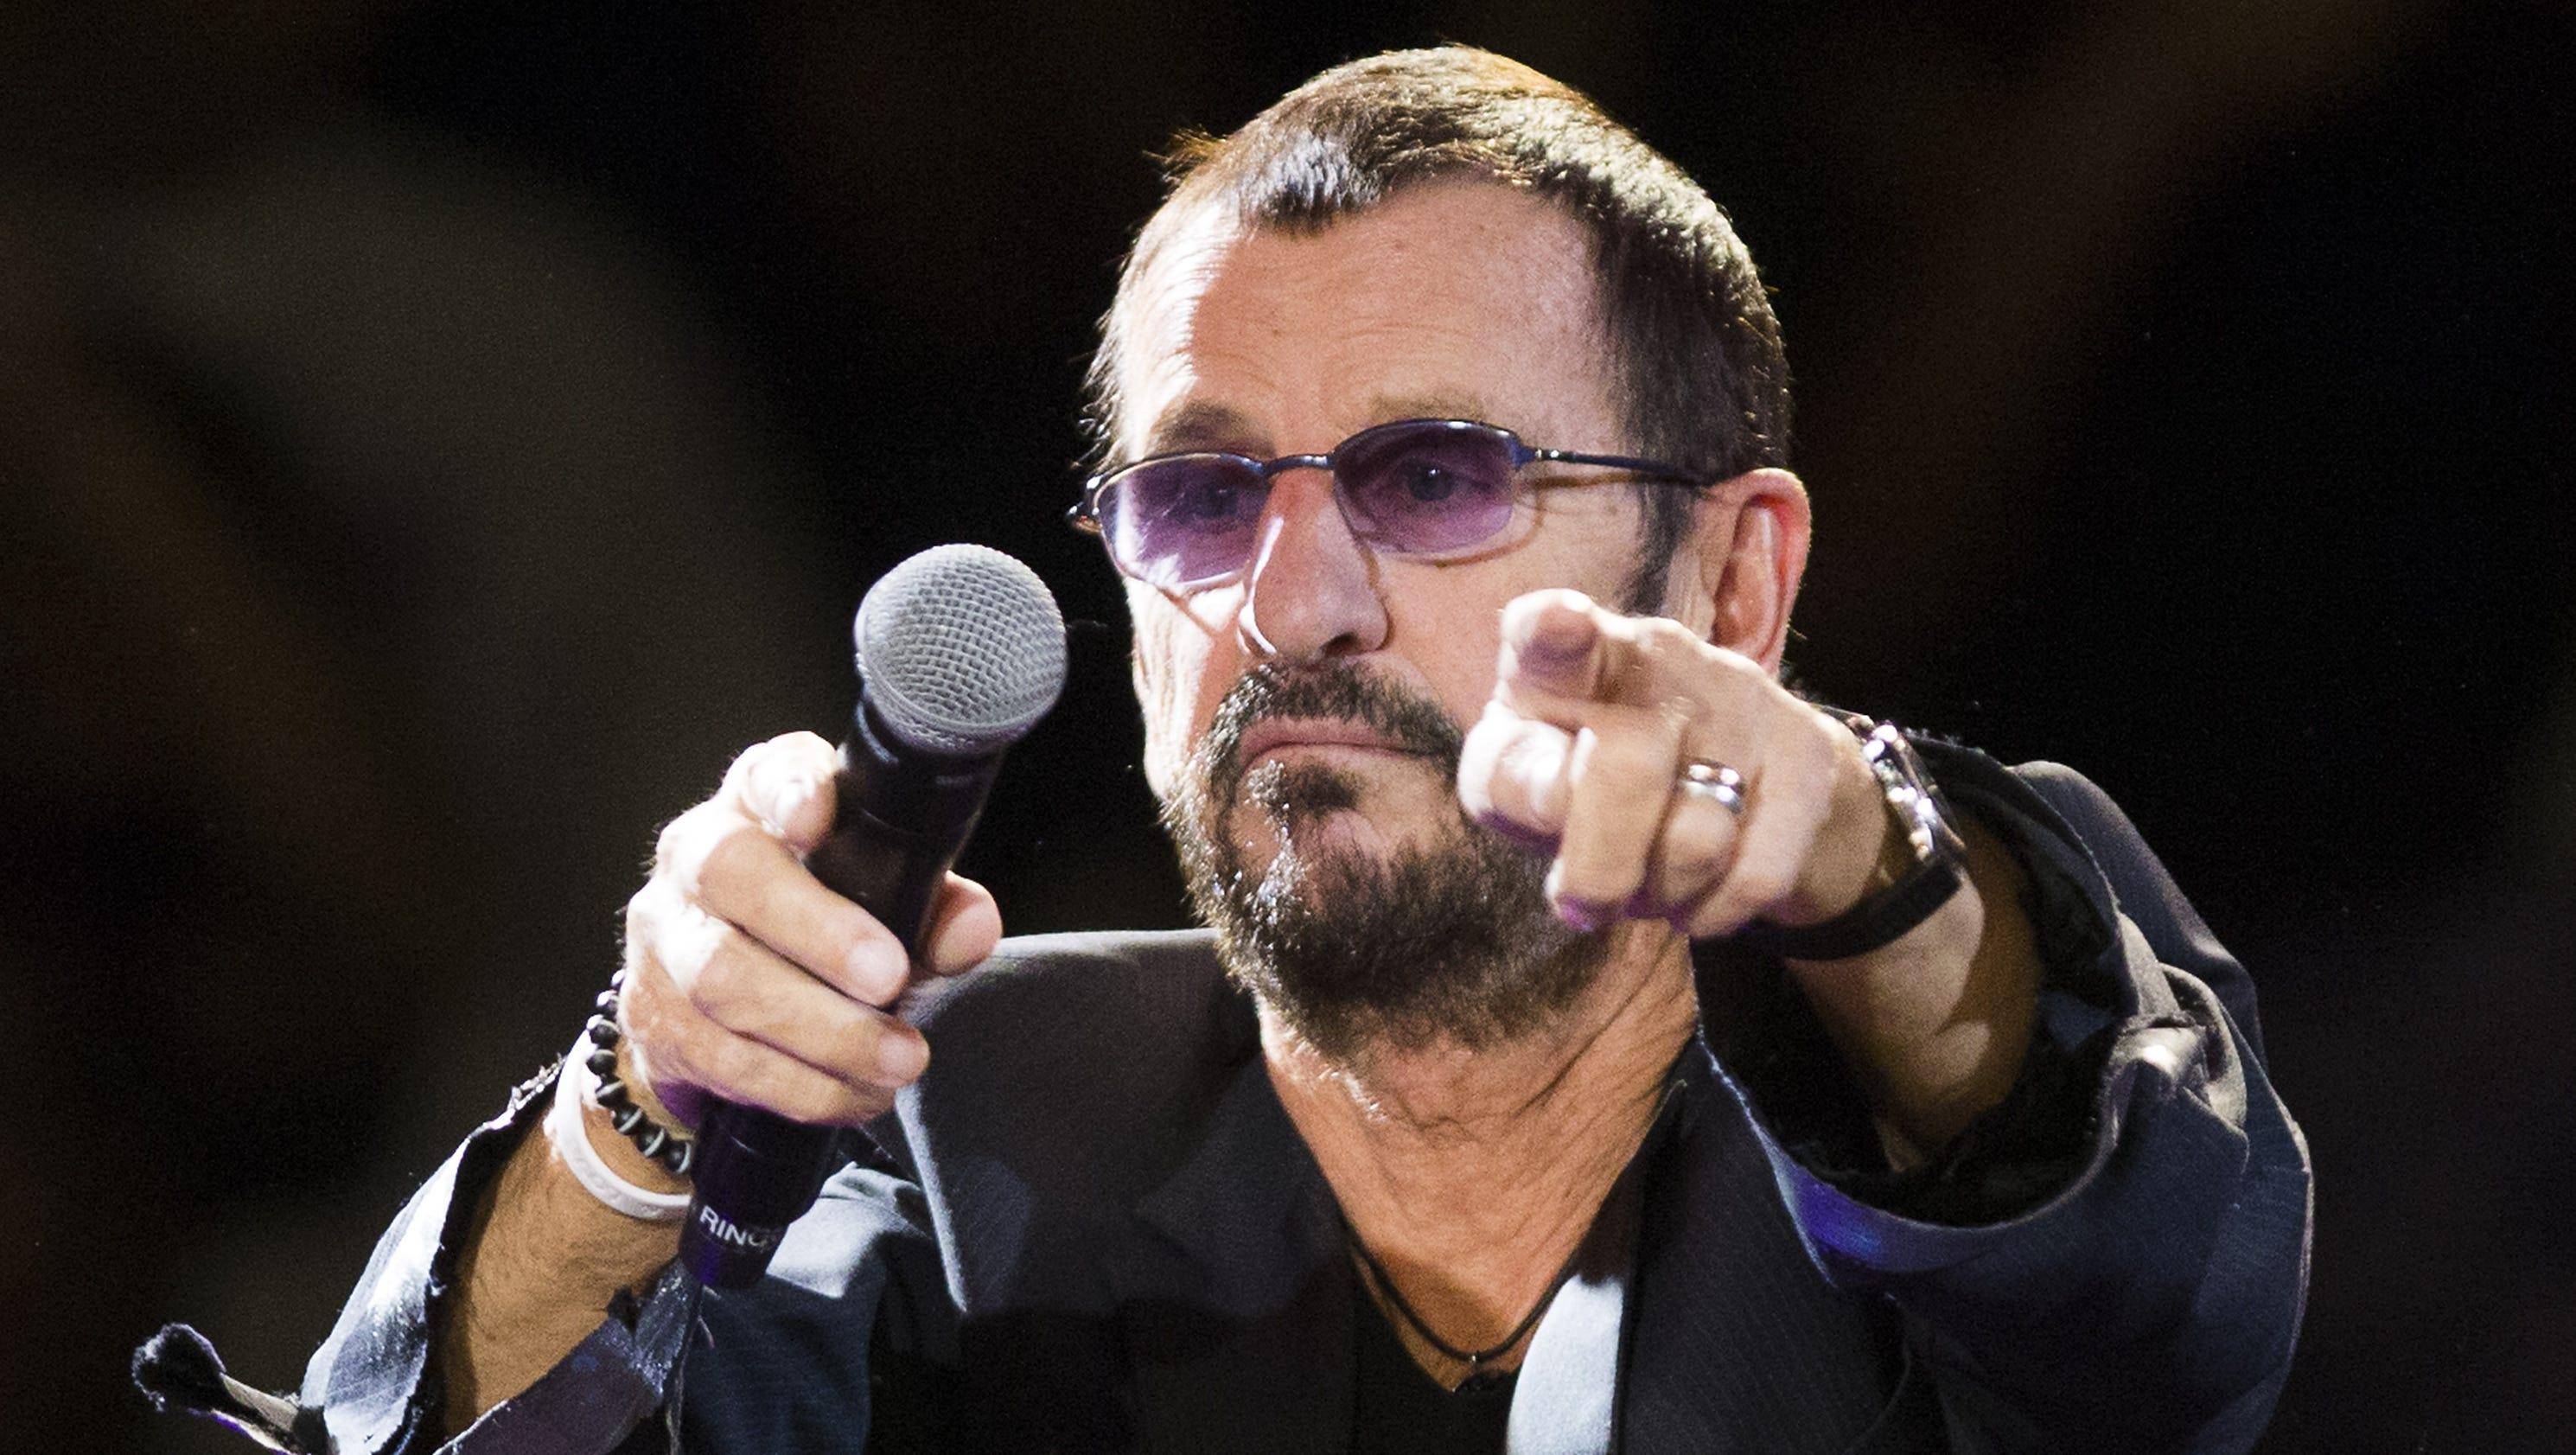 Ringo Starr 2018 Worth CountryBaptist